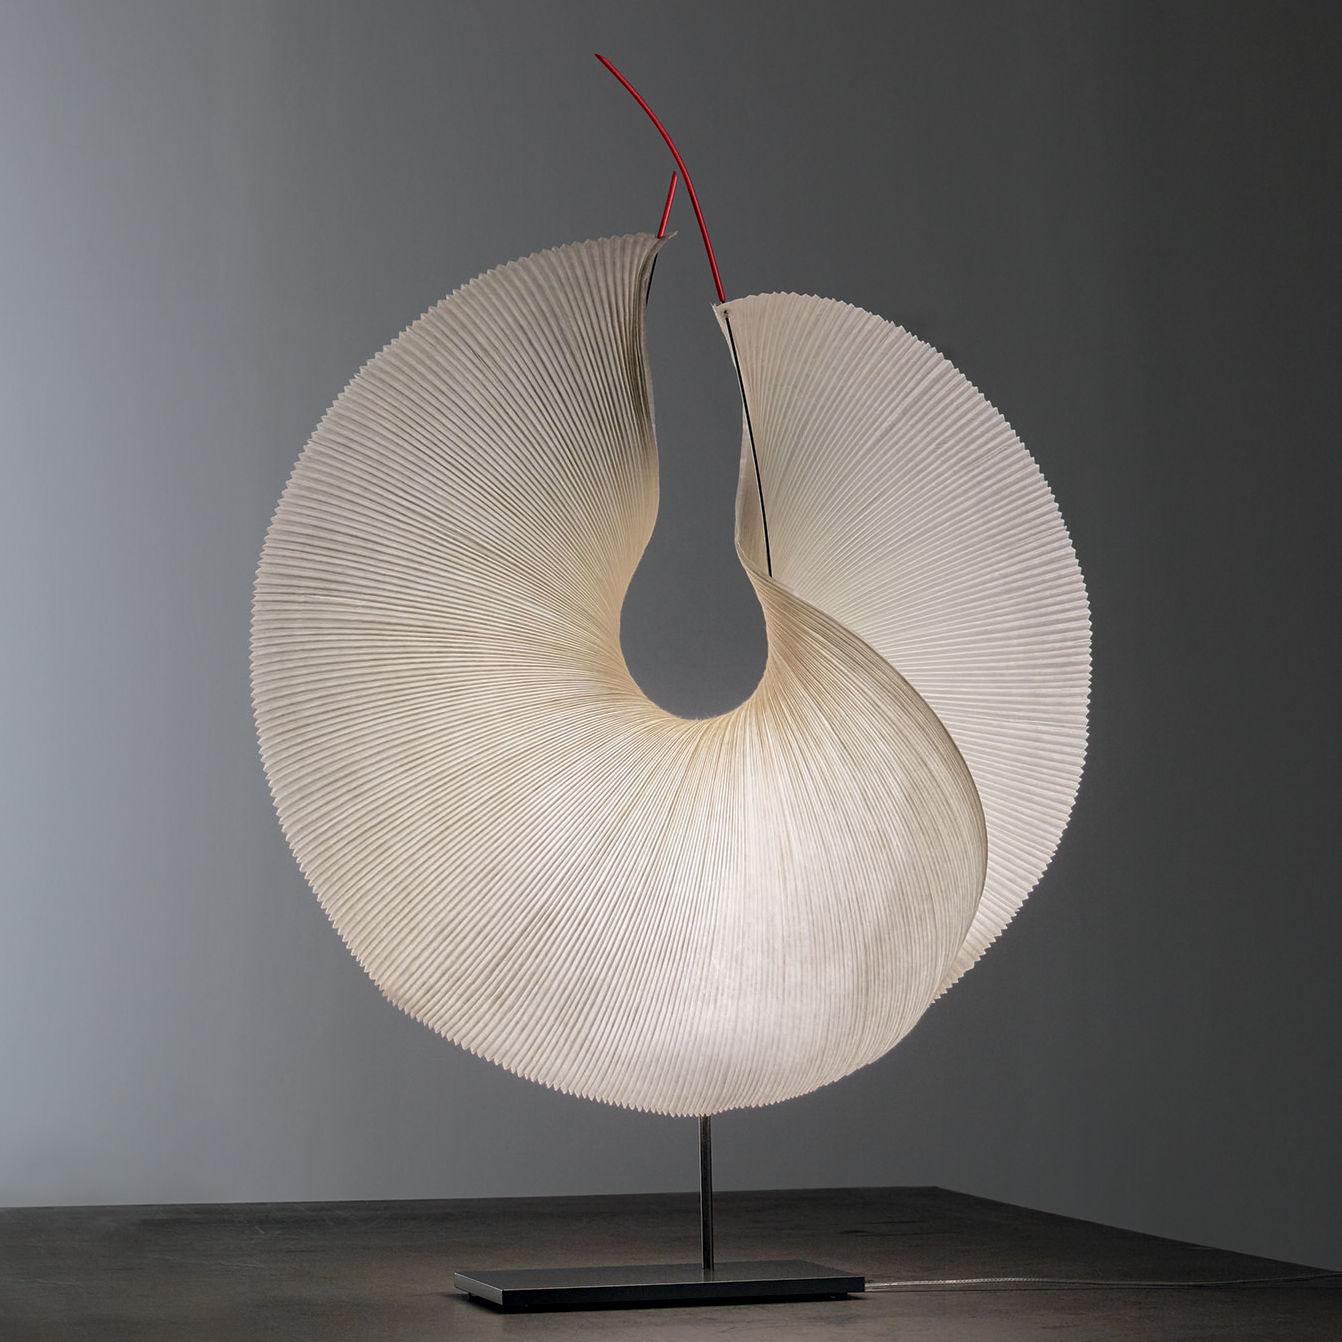 Leuchten - Tischleuchten - The MaMo Nouchies LED Tischleuchte / Yoruba Rose - Ingo Maurer - Beige - lackiertes Metall, Papier japonais